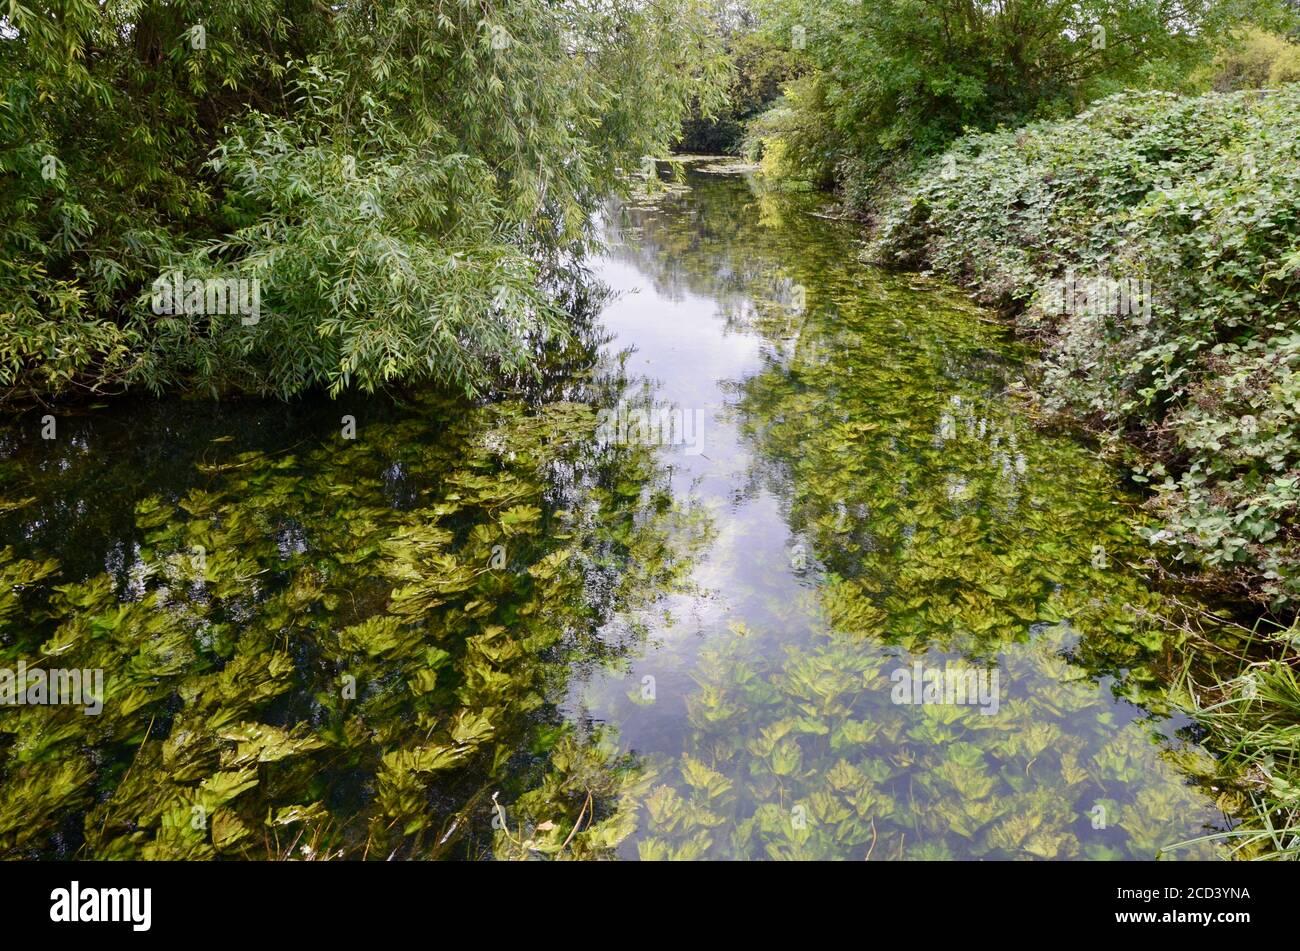 walthamstow wetlands reservoirs N17 ferry lane london england UK Stock Photo